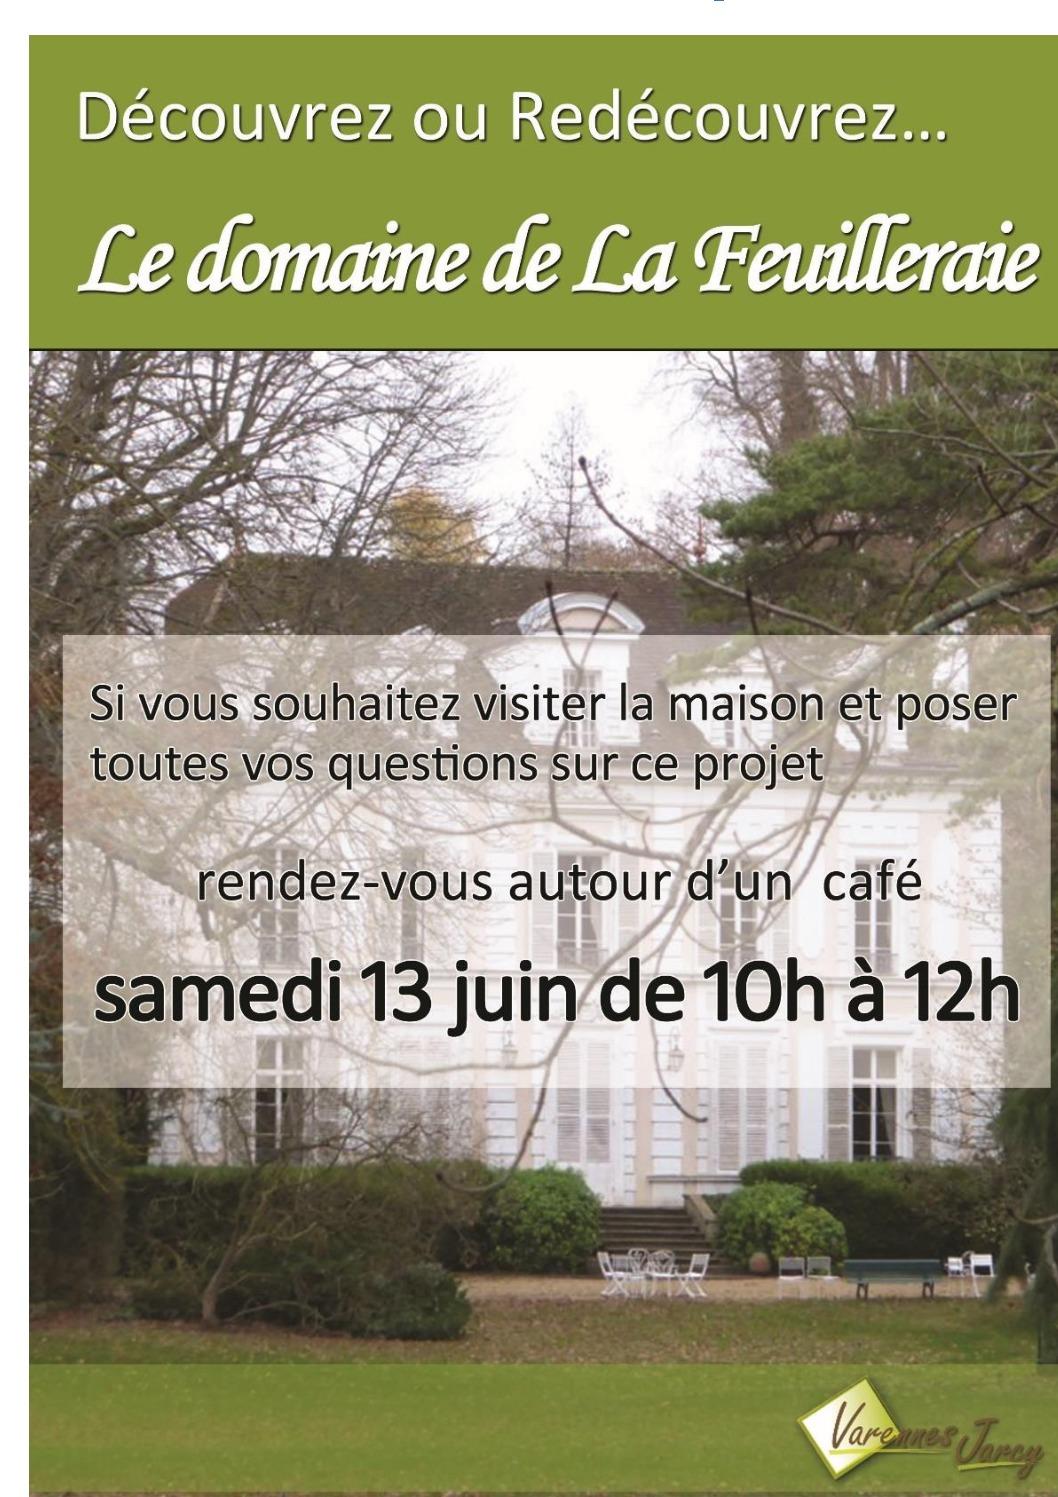 thumbnail of Flyer Feuilleraie 070620